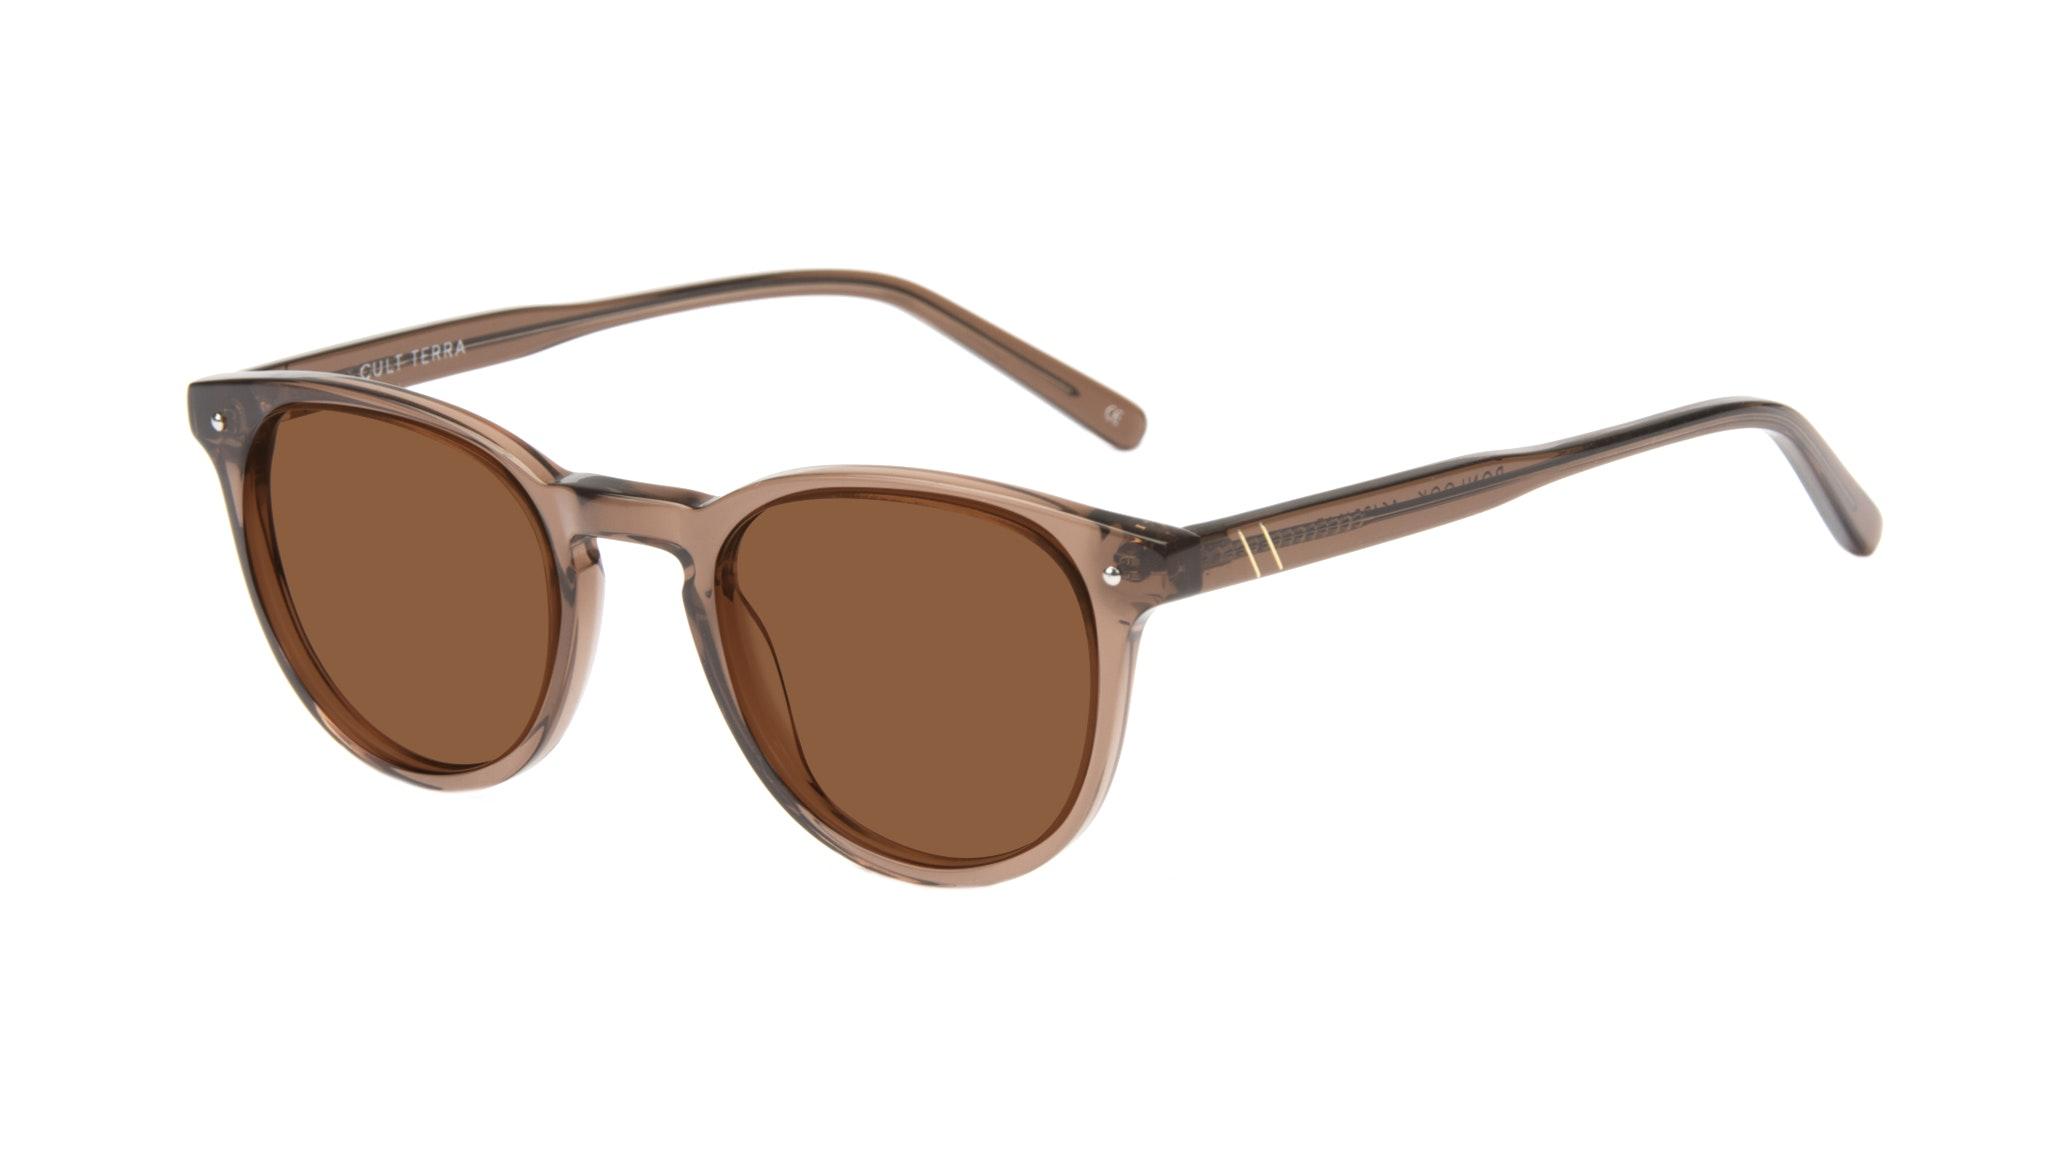 Affordable Fashion Glasses Round Sunglasses Men Cult Terra Tilt